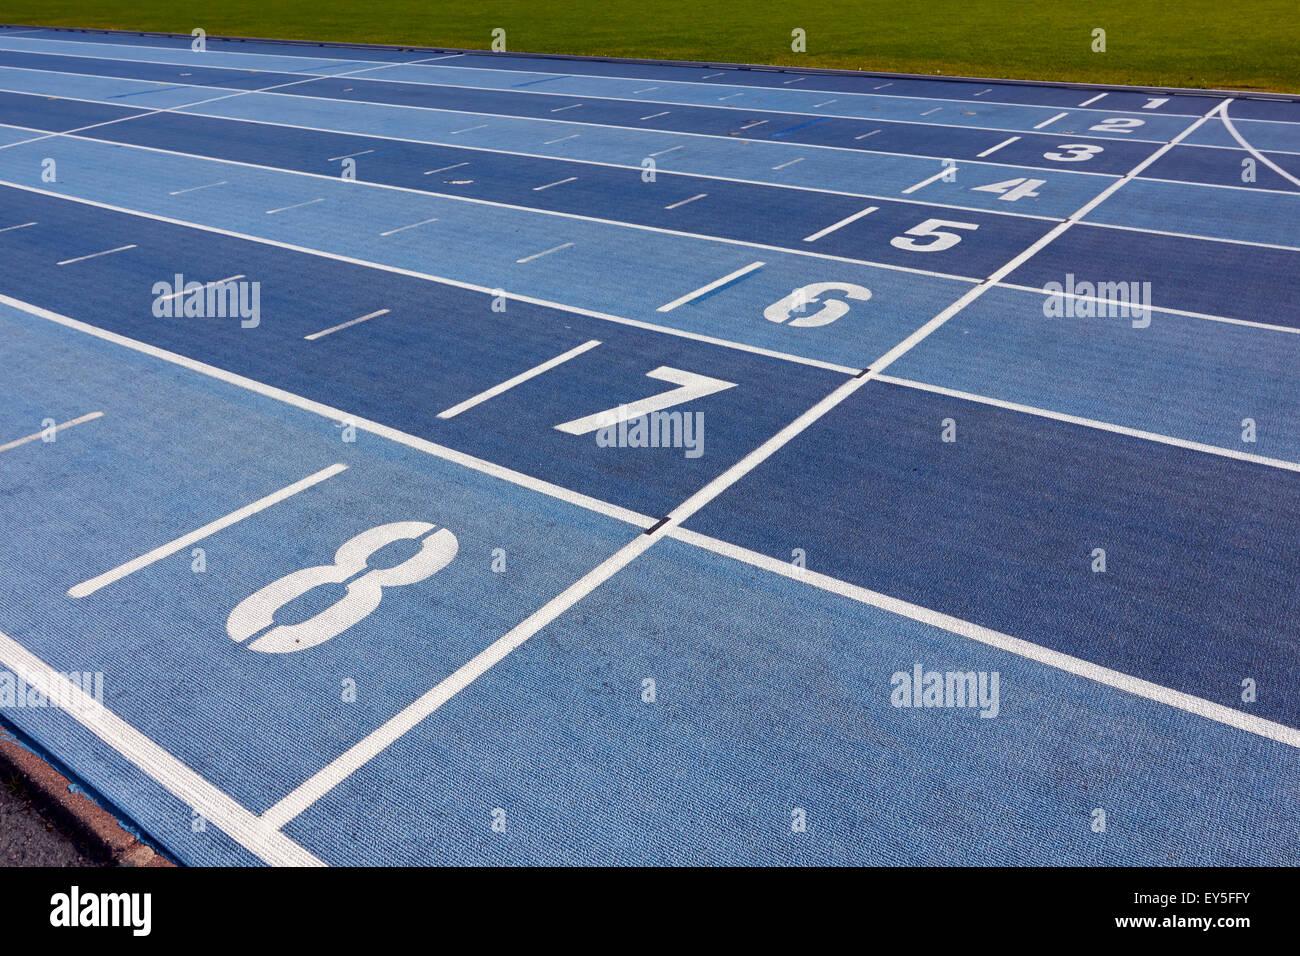 pistes d'athlétisme Photo Stock